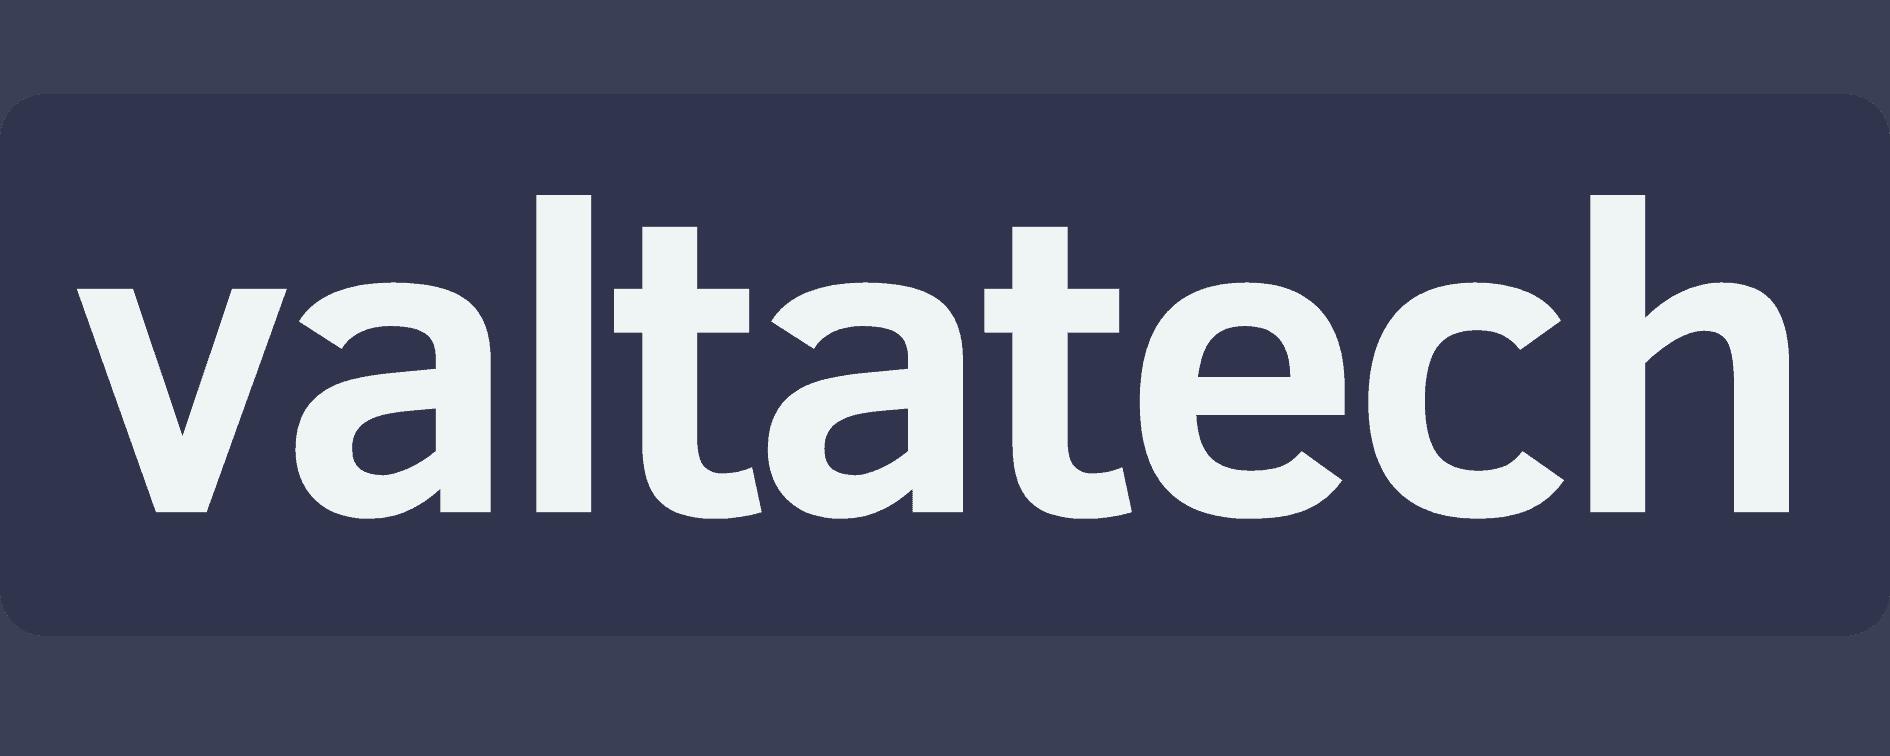 Valtatech